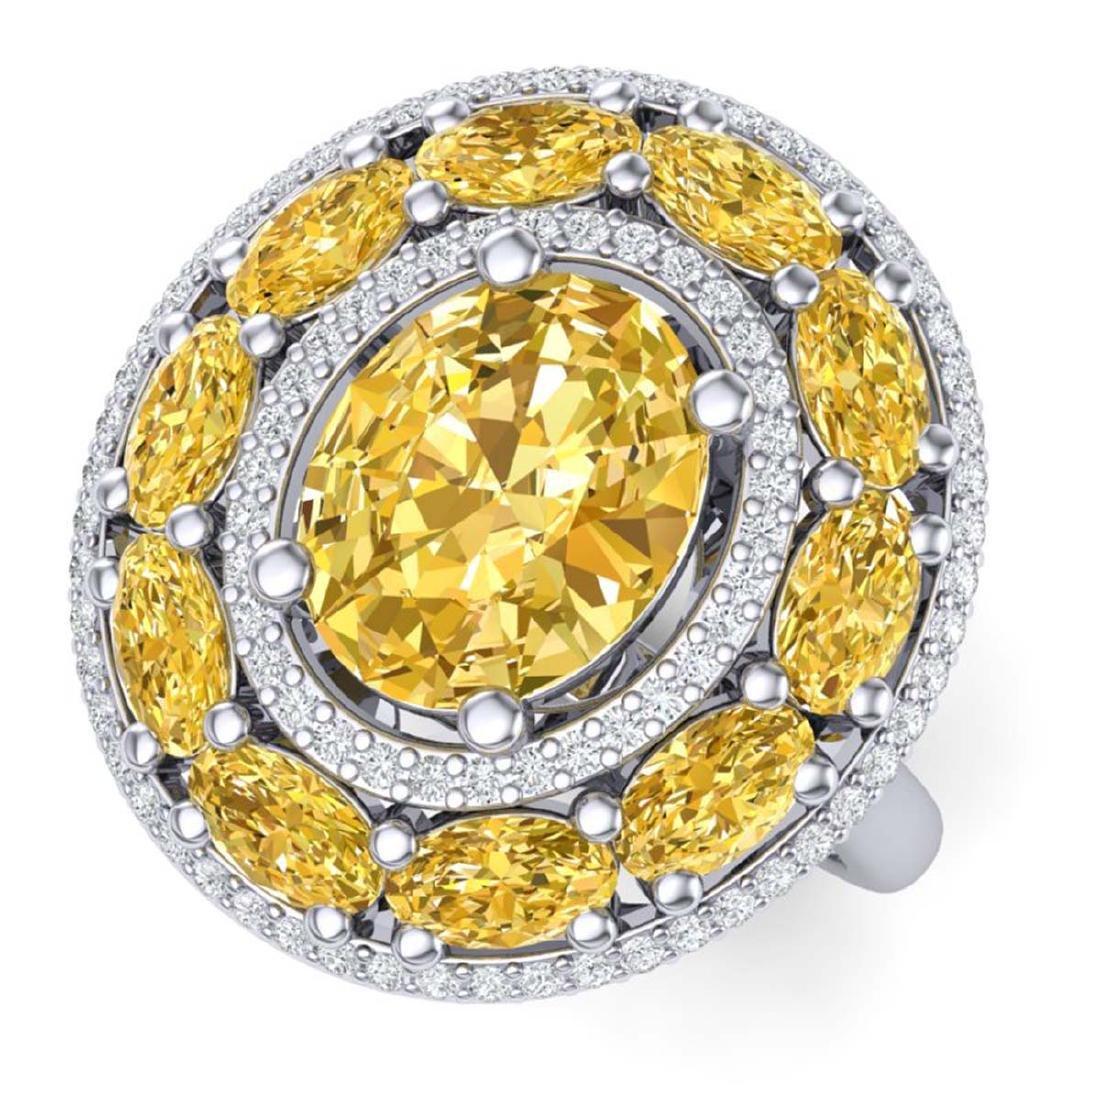 7.21 ctw Canary Citrine & VS Diamond Ring 18K White